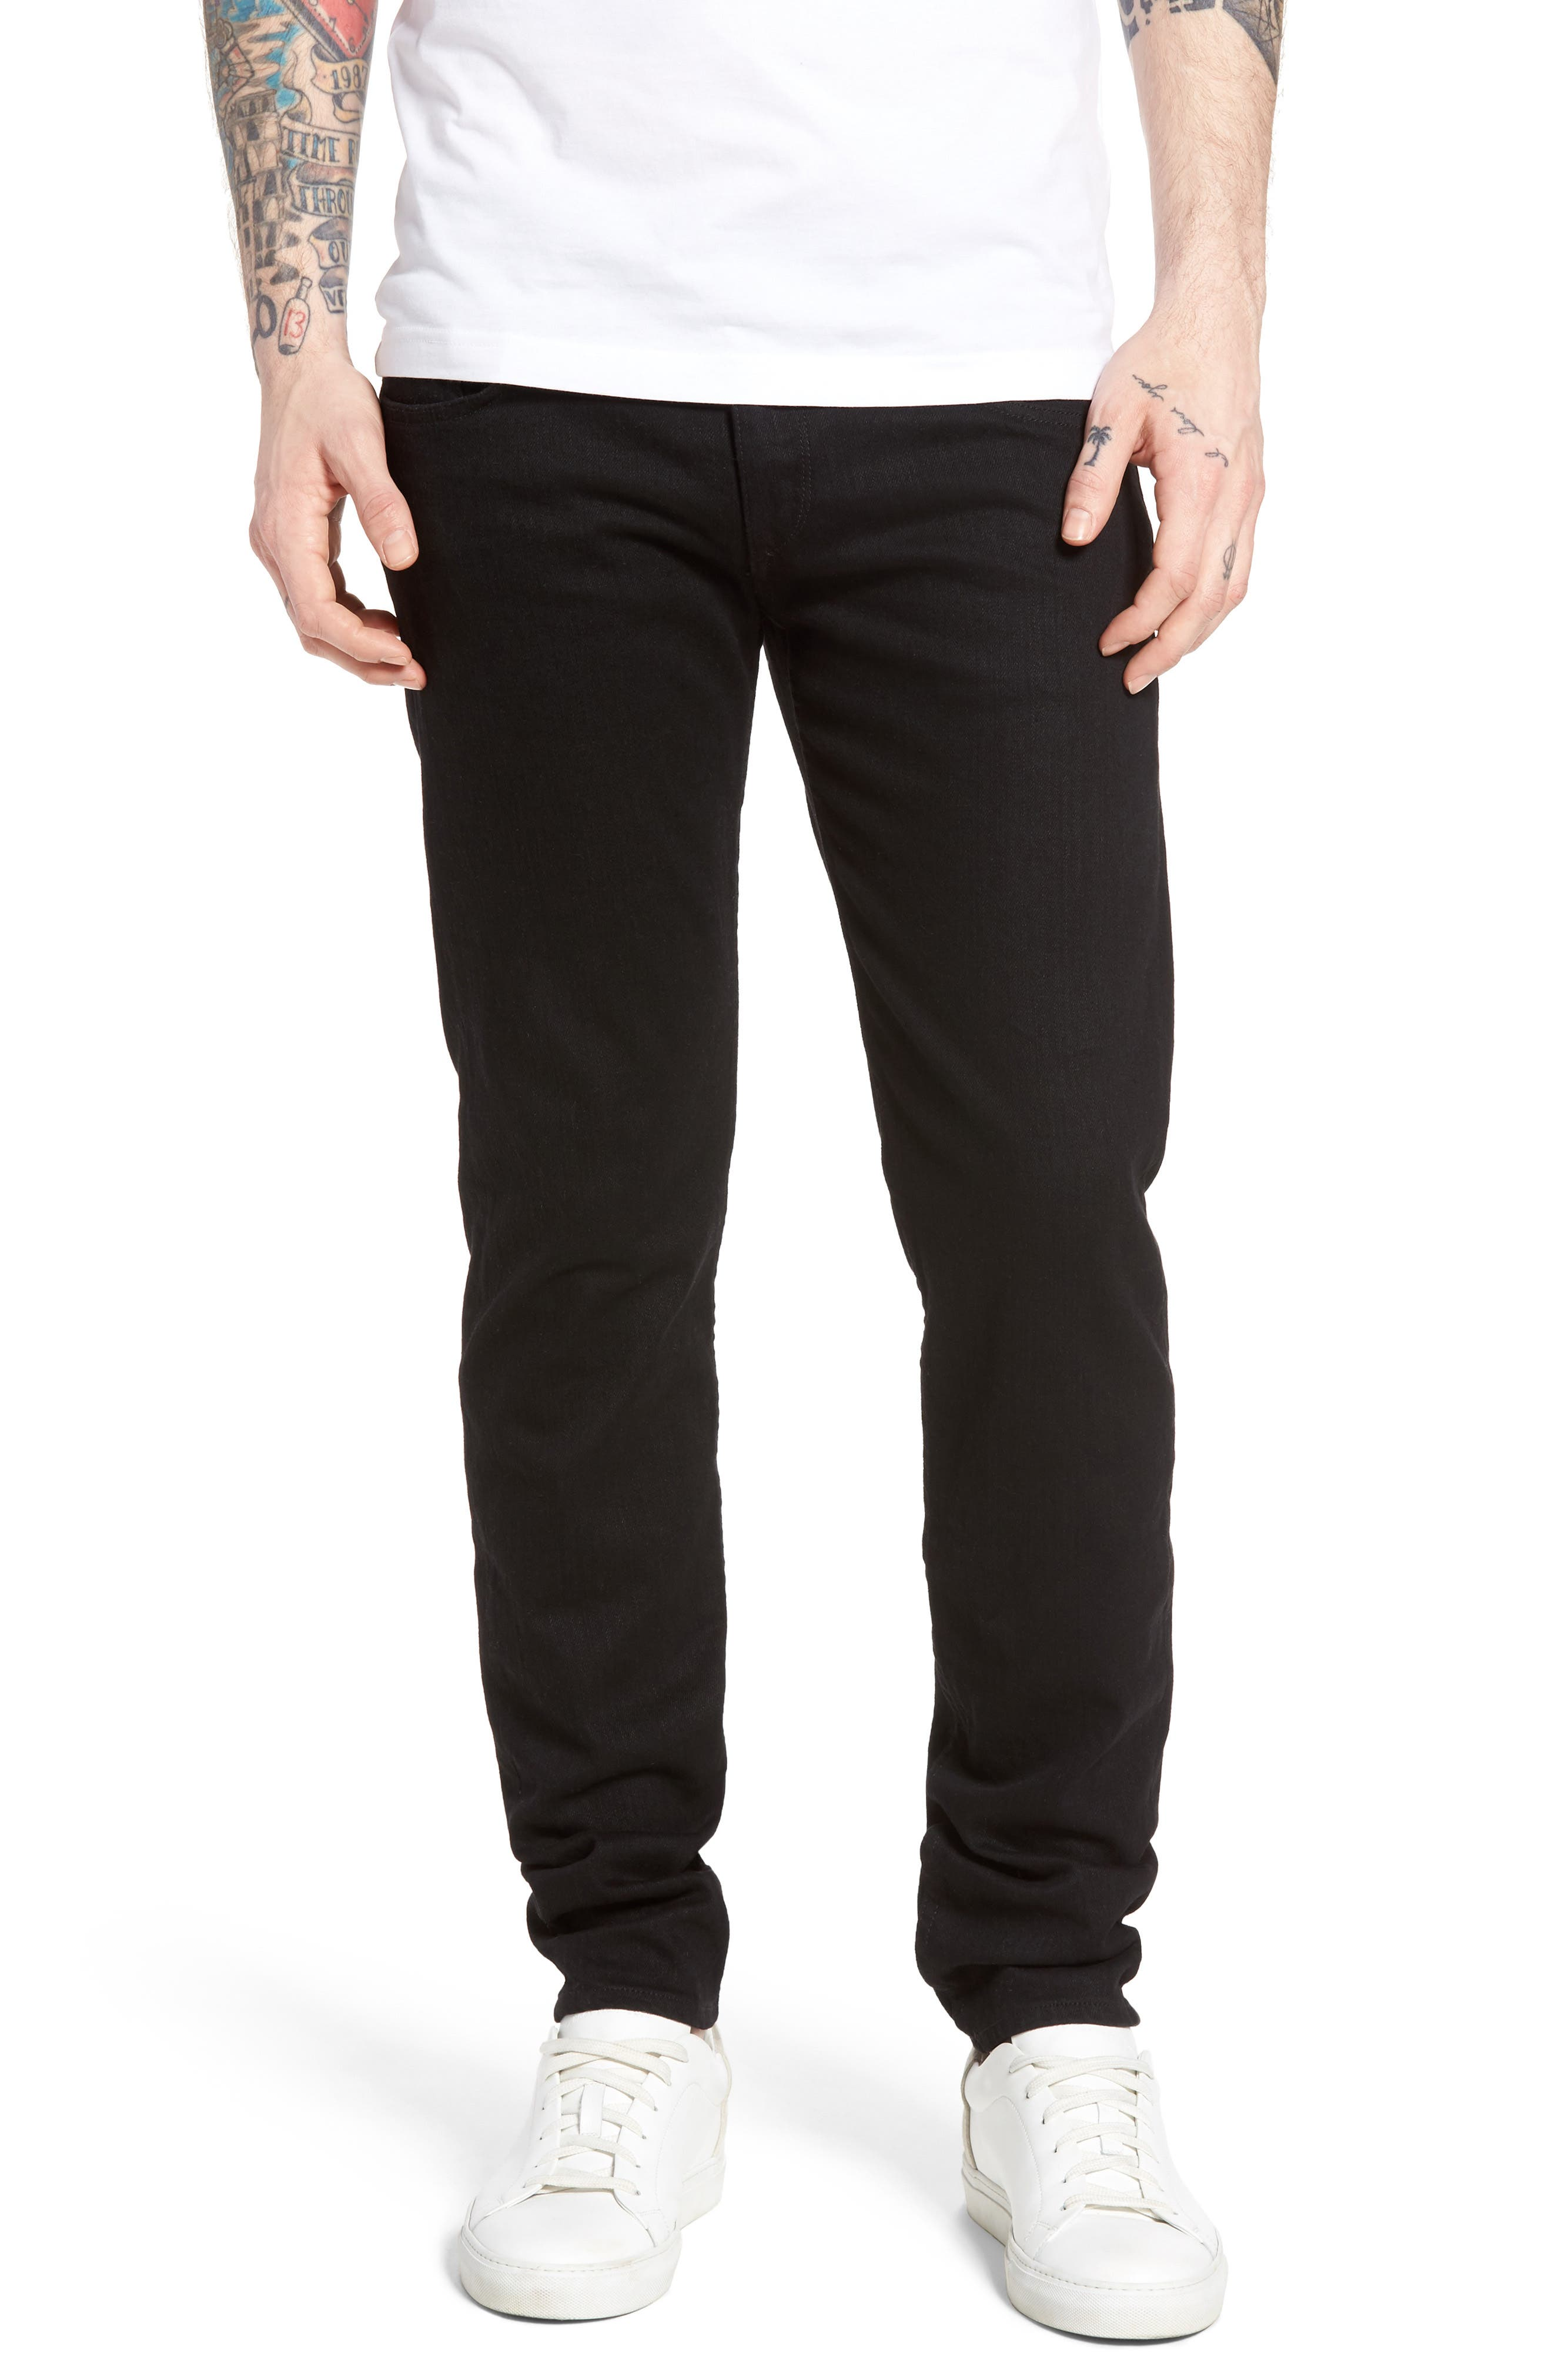 Main Image - rag & bone Standard Issue Fit 1 Skinny Fit Jeans